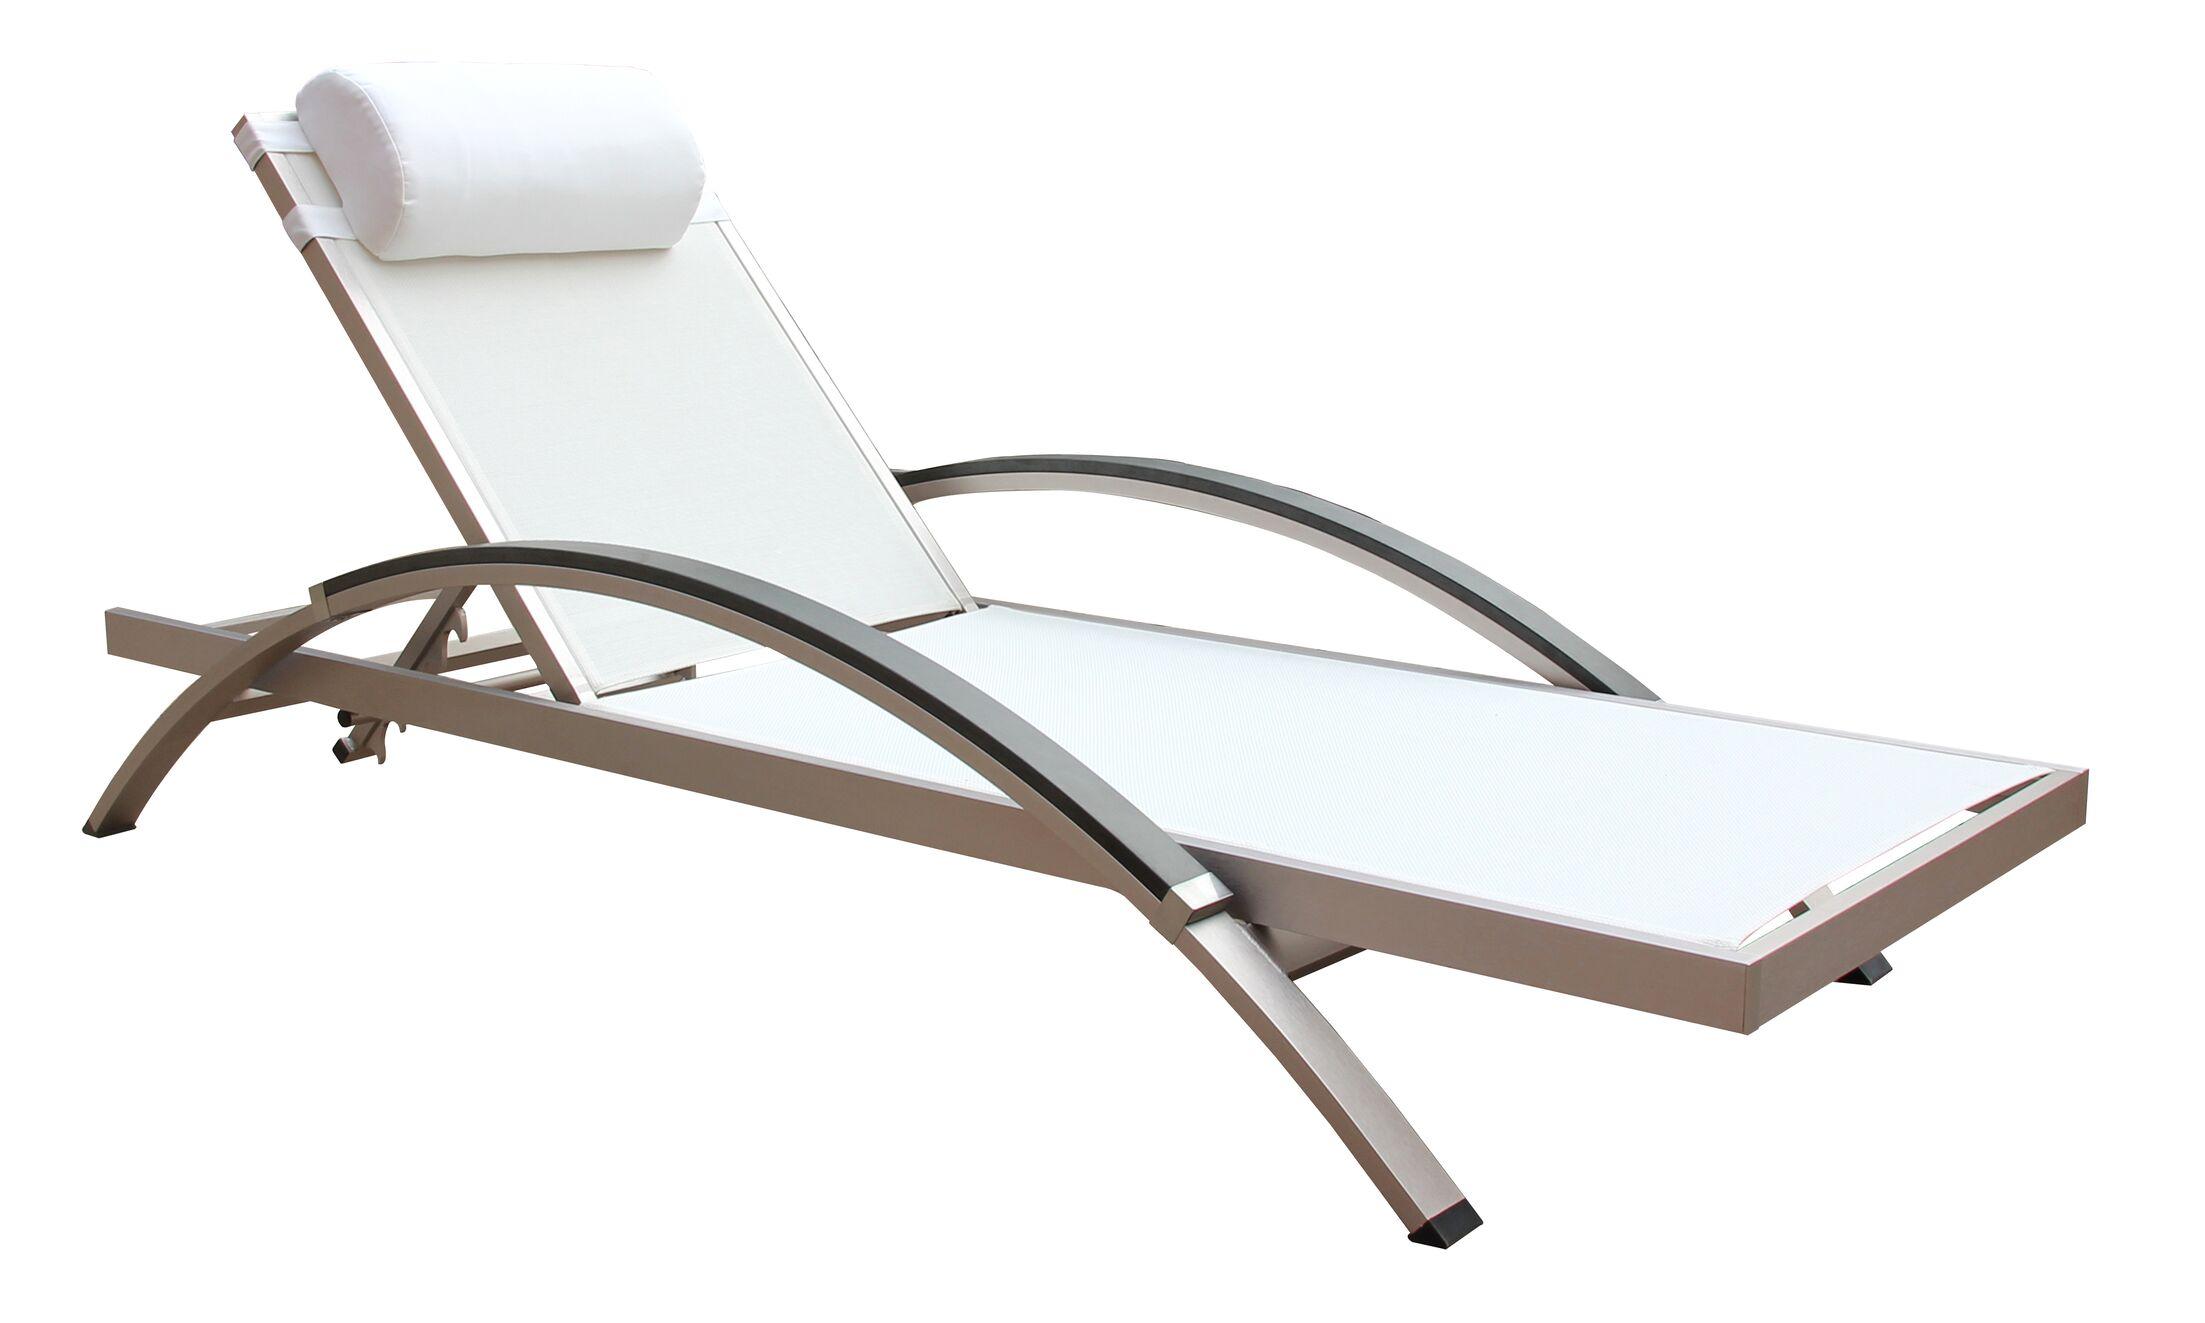 Galicia Chaise Lounge